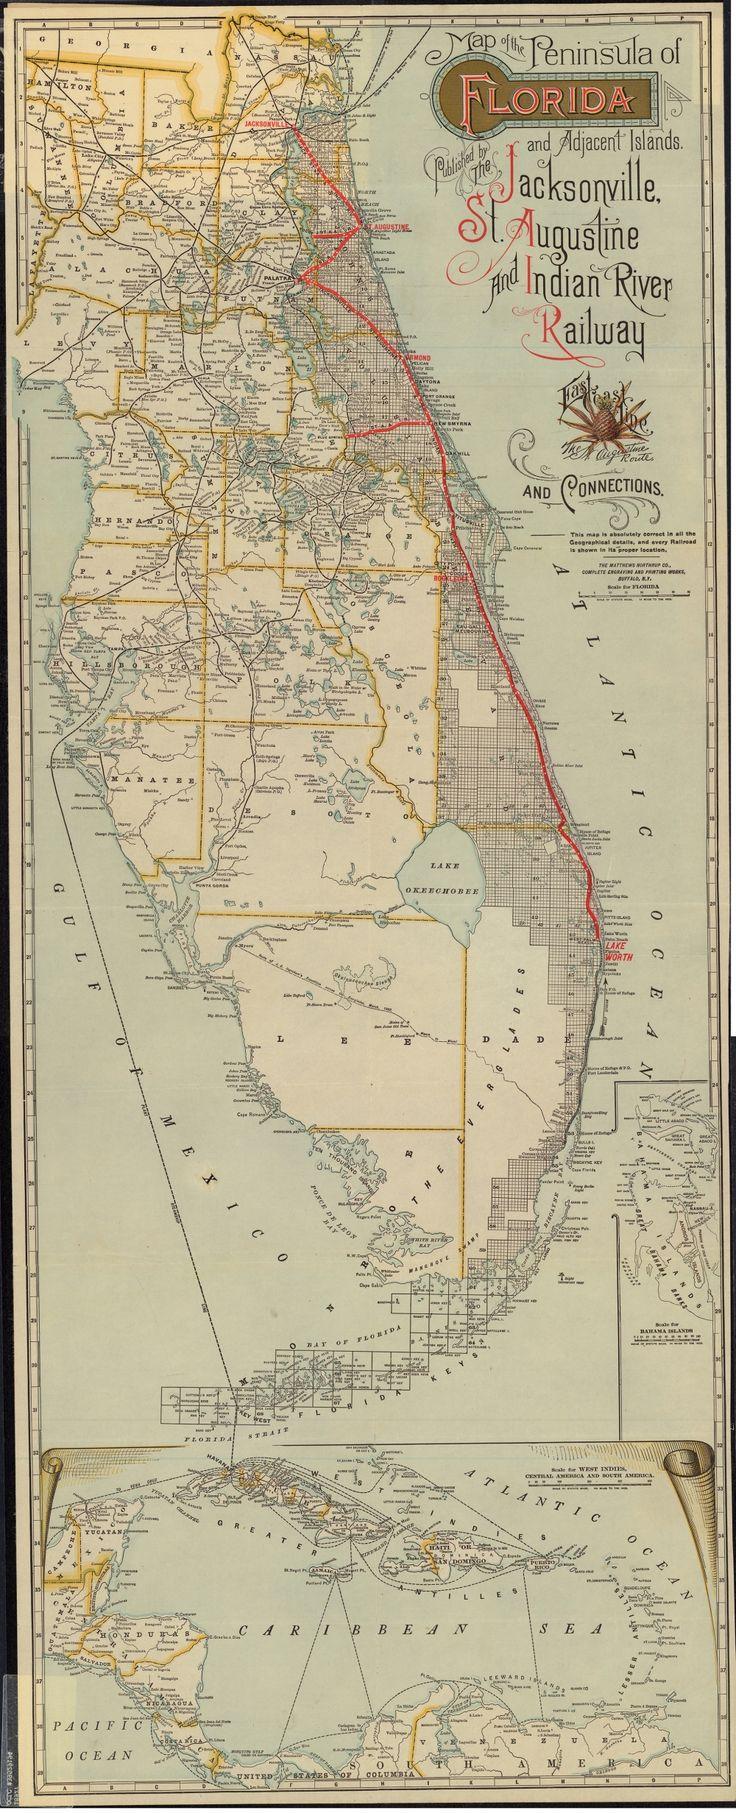 Florida Memory - East Coast Line: Florida Peninsula, 1892